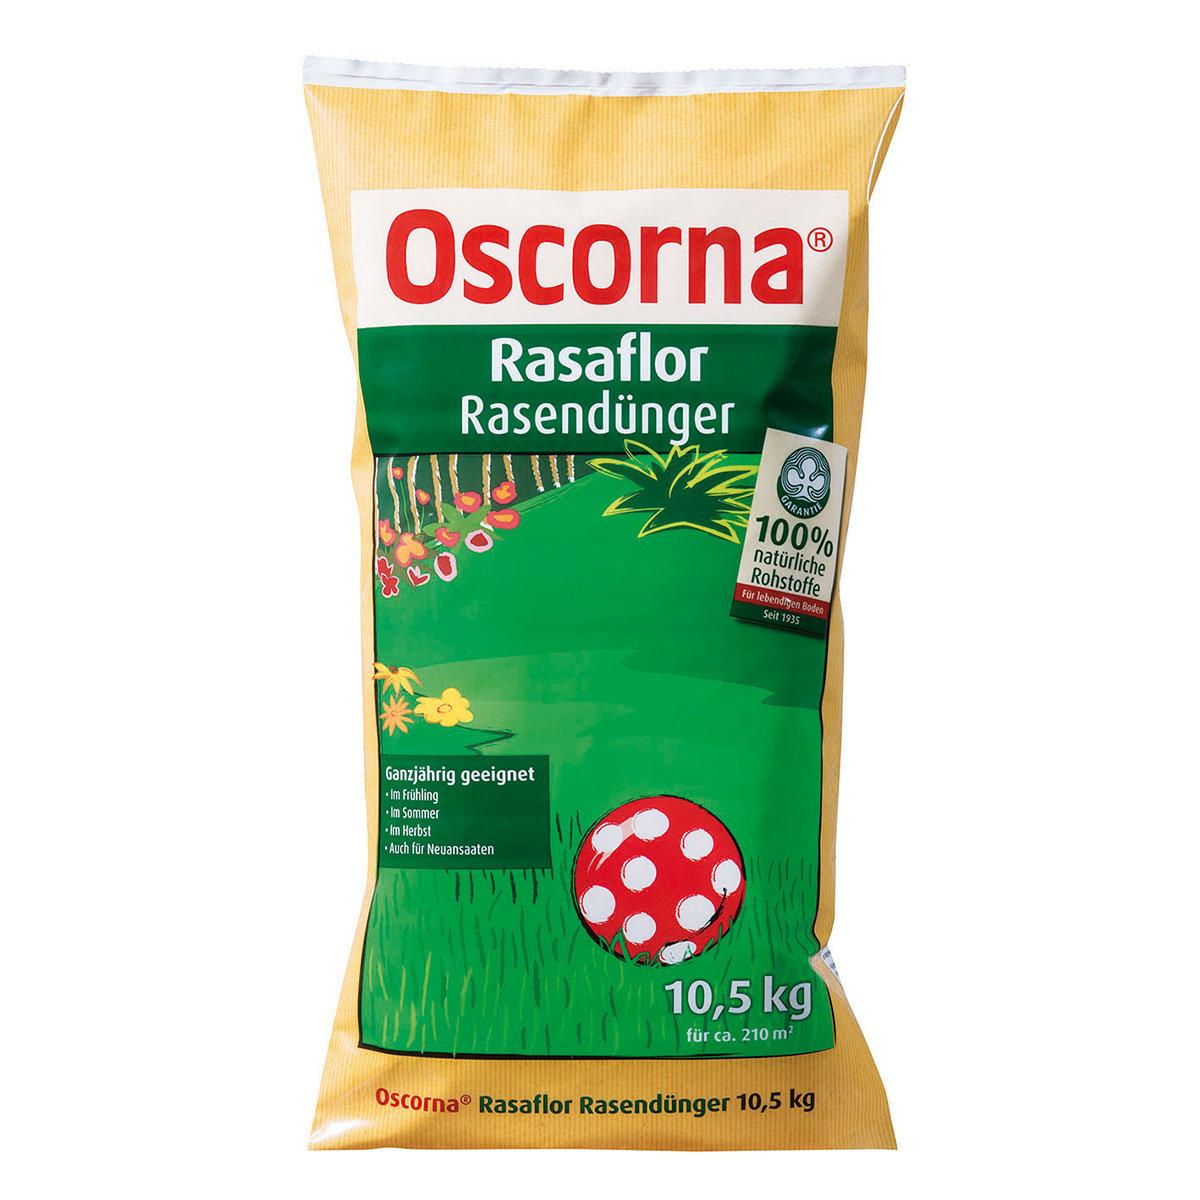 Rasaflor Rasendünger, 10,5 kg